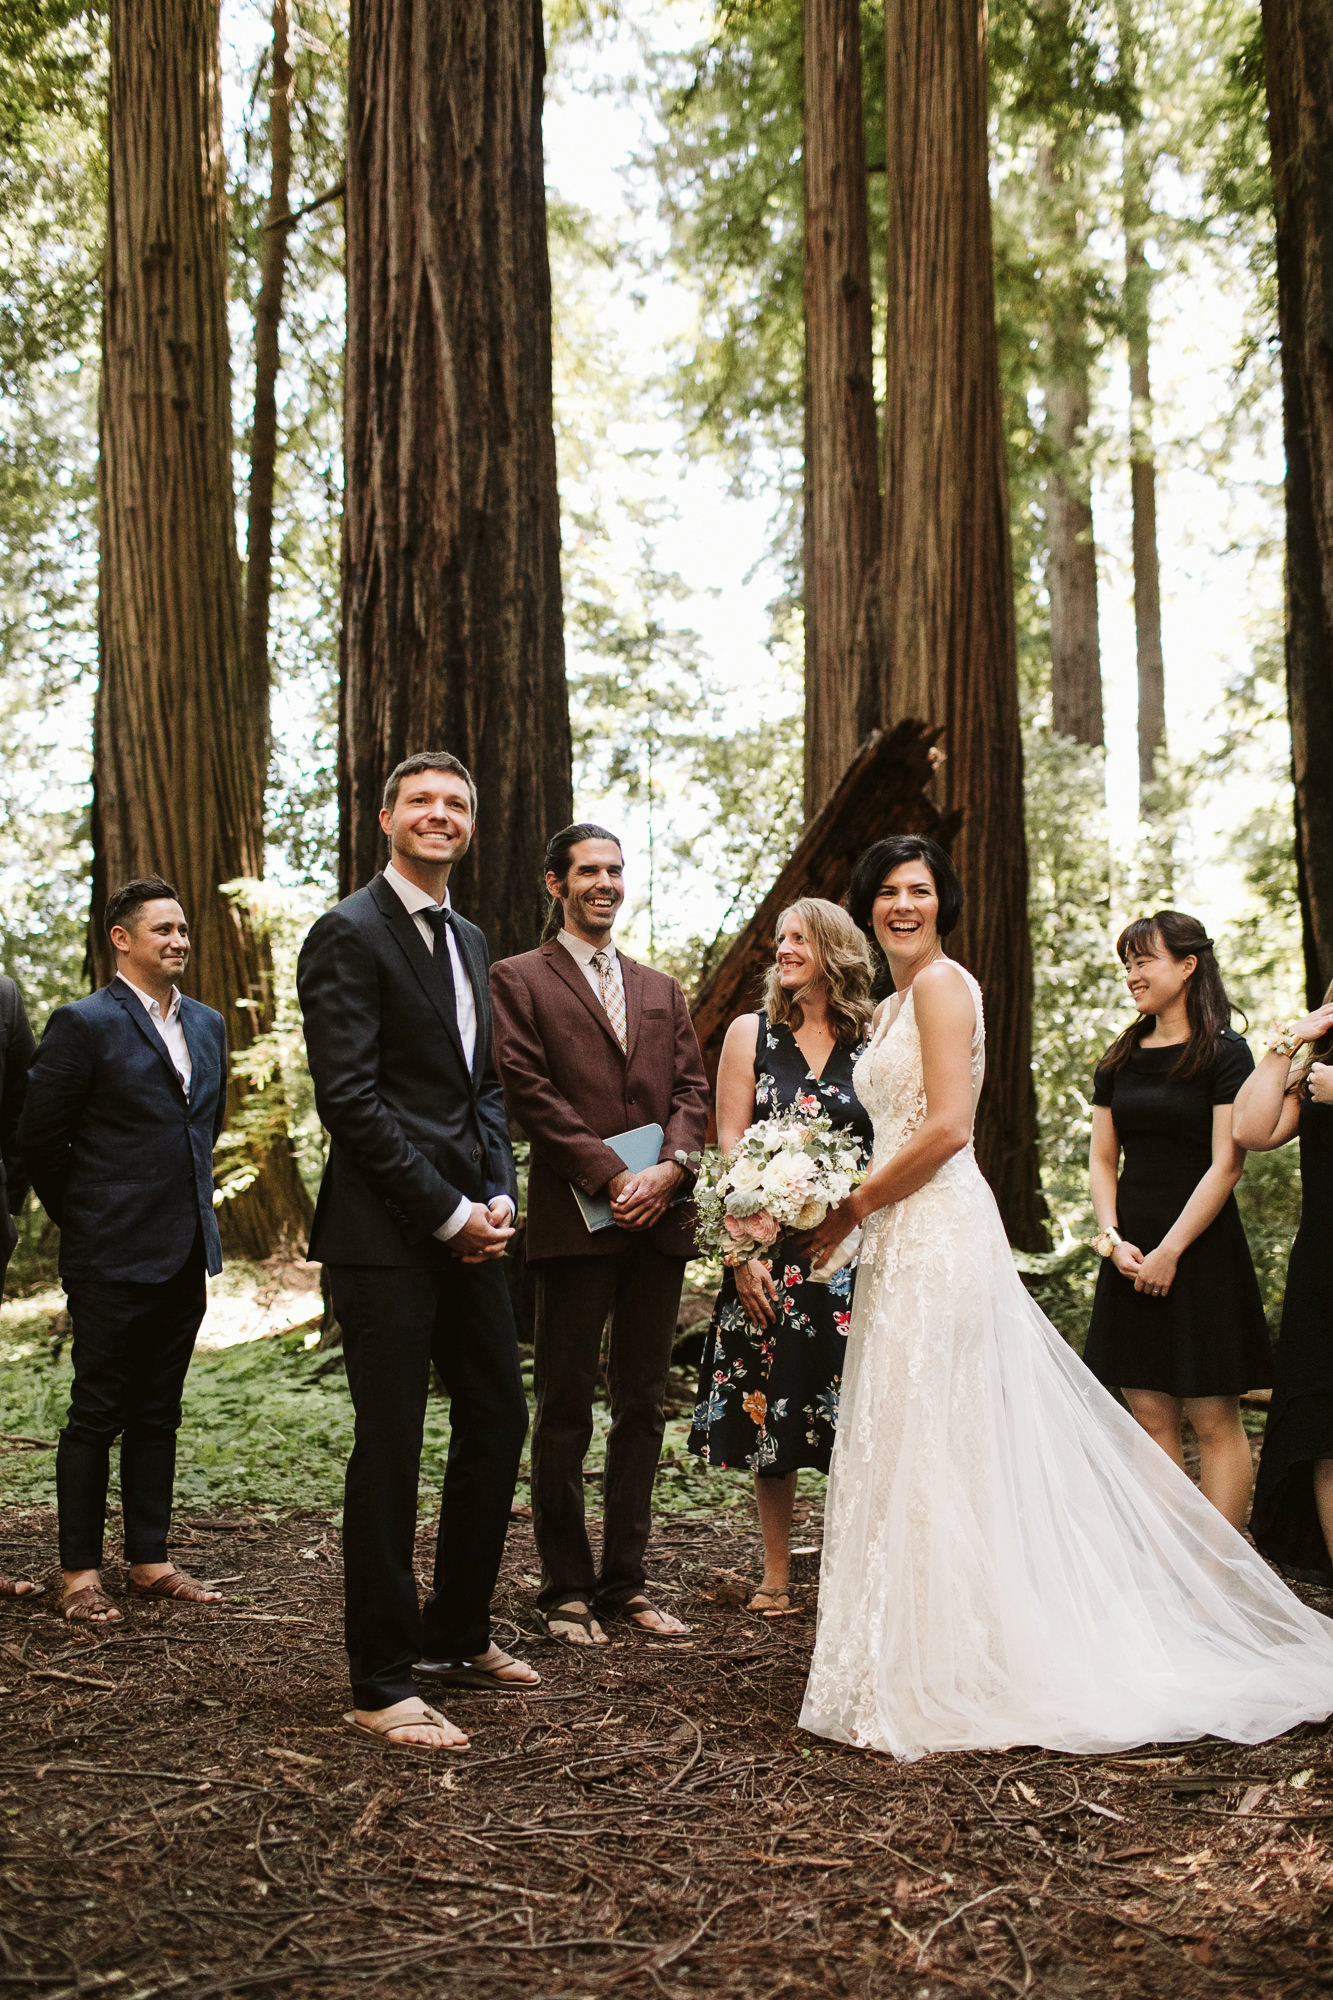 California-wedding-photographer-alfonso-flores-pamplin-groove-174.jpg